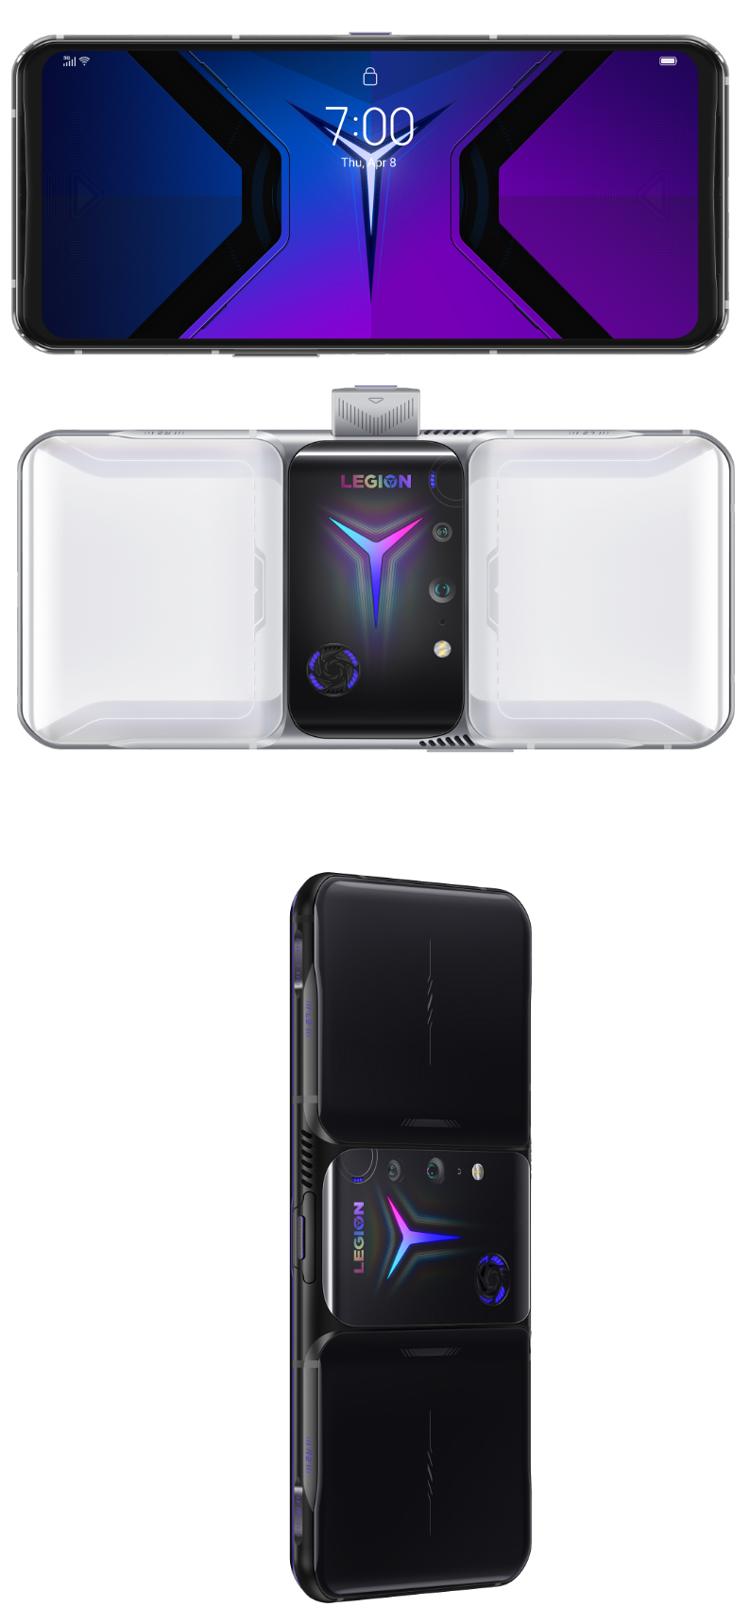 Lenovo dévoile son smartphone gaming : le Legion Phone Duel 2